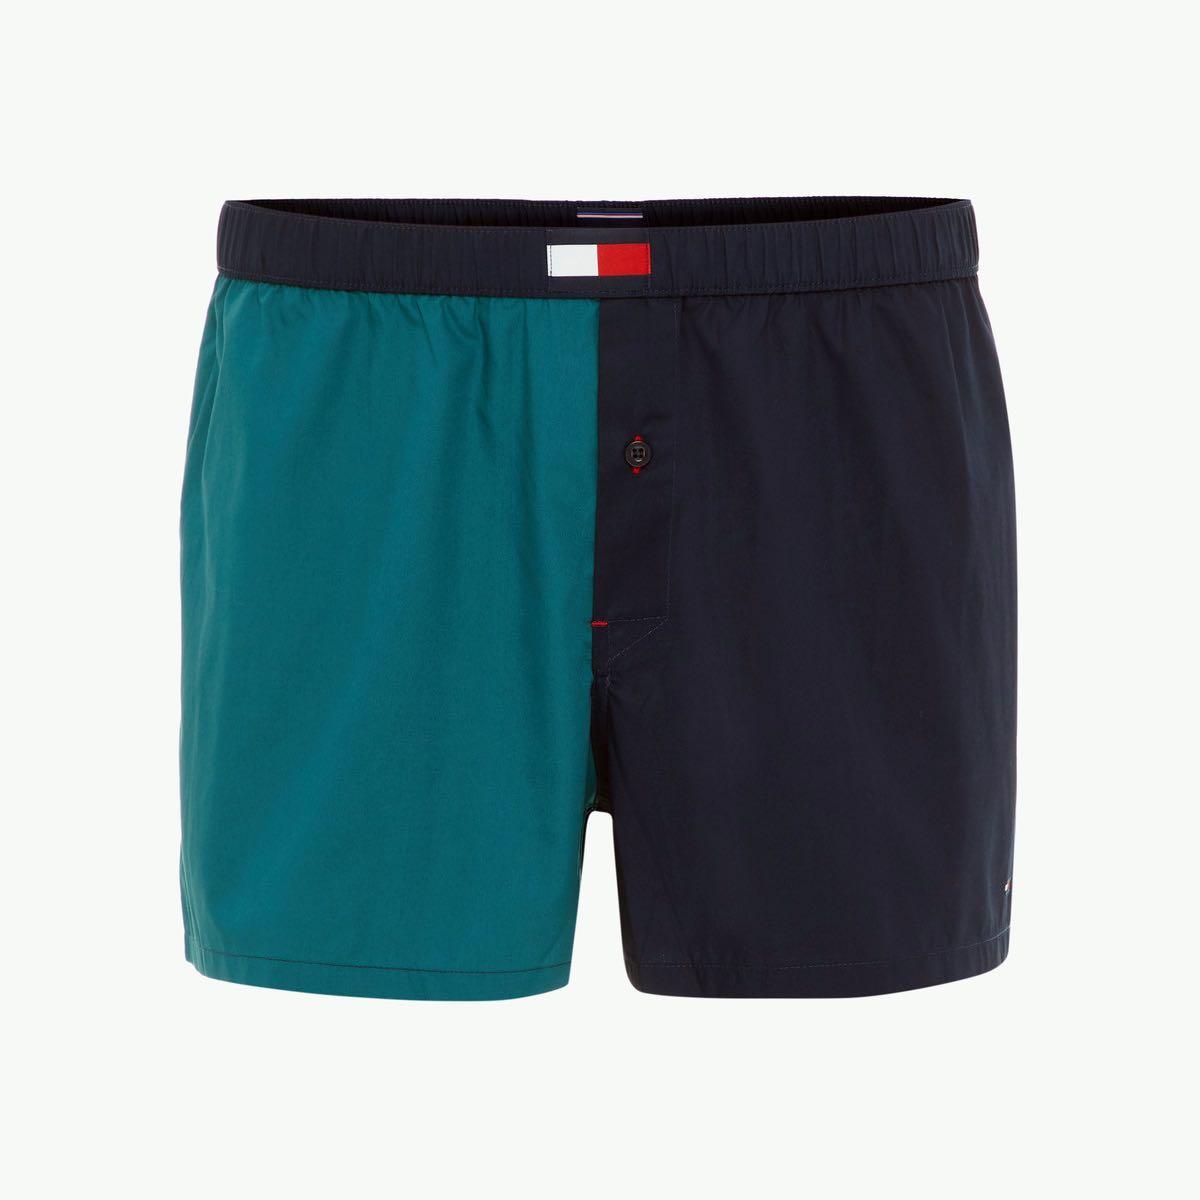 706d1c0806e7 TOMMY HILFIGER Modro zelené trenky Woven Boxer S - Glami.sk